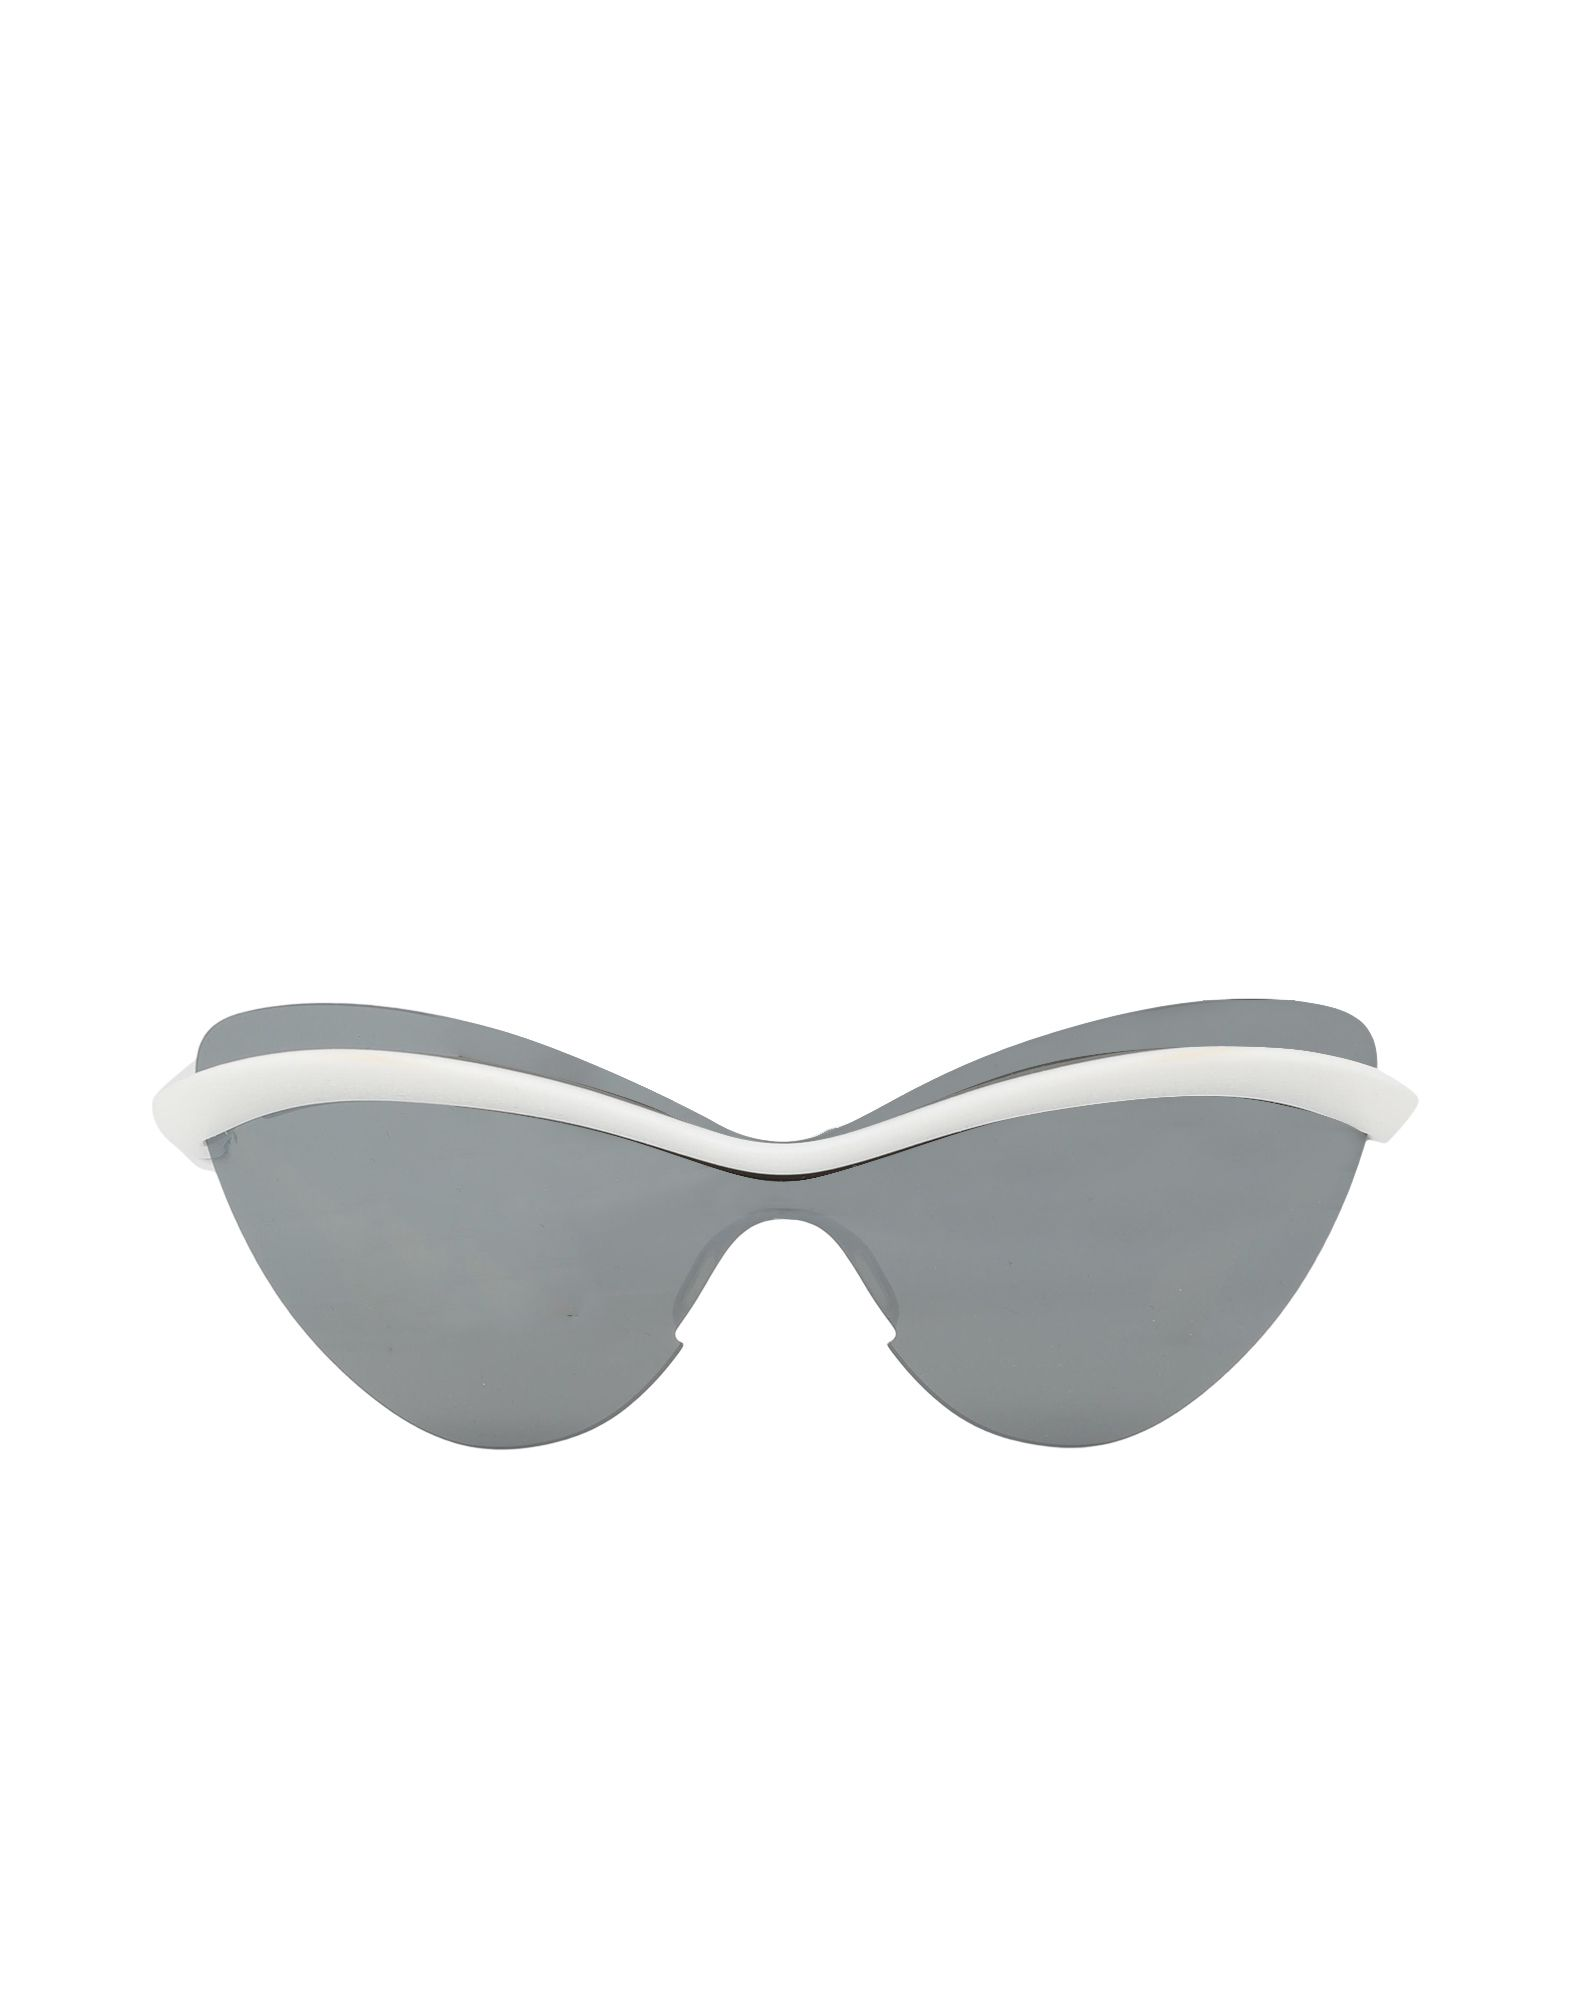 MYKITA + MAISON MARGIELA Sunglasses - Item 46720739